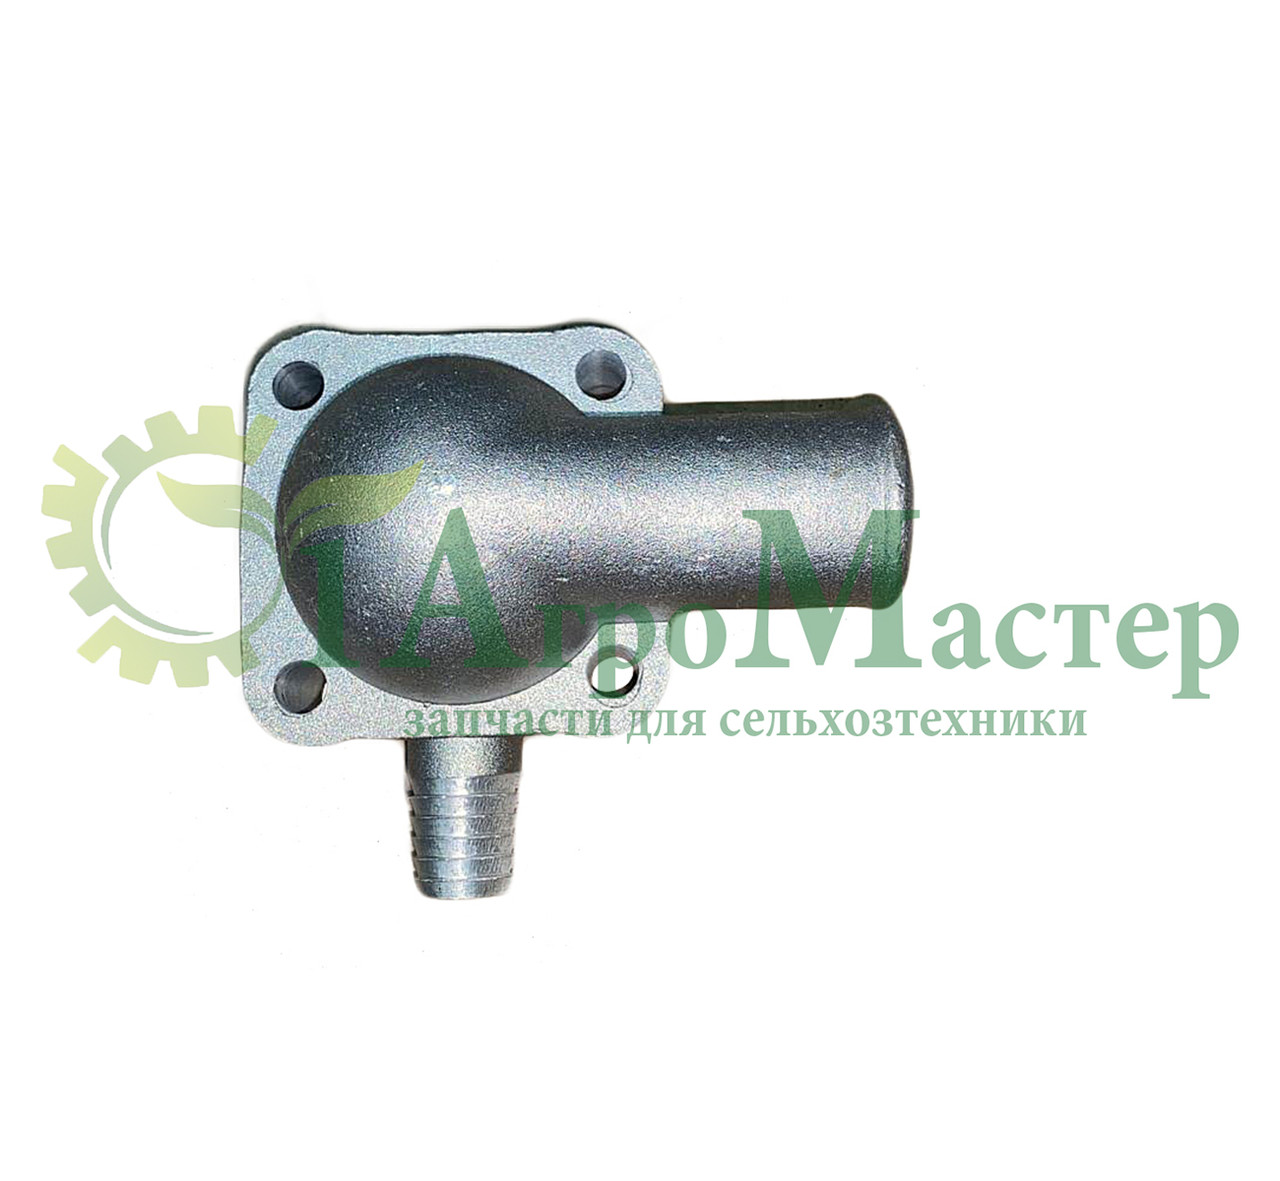 Корпус термостата 50-1306025 МТЗ, Д-240